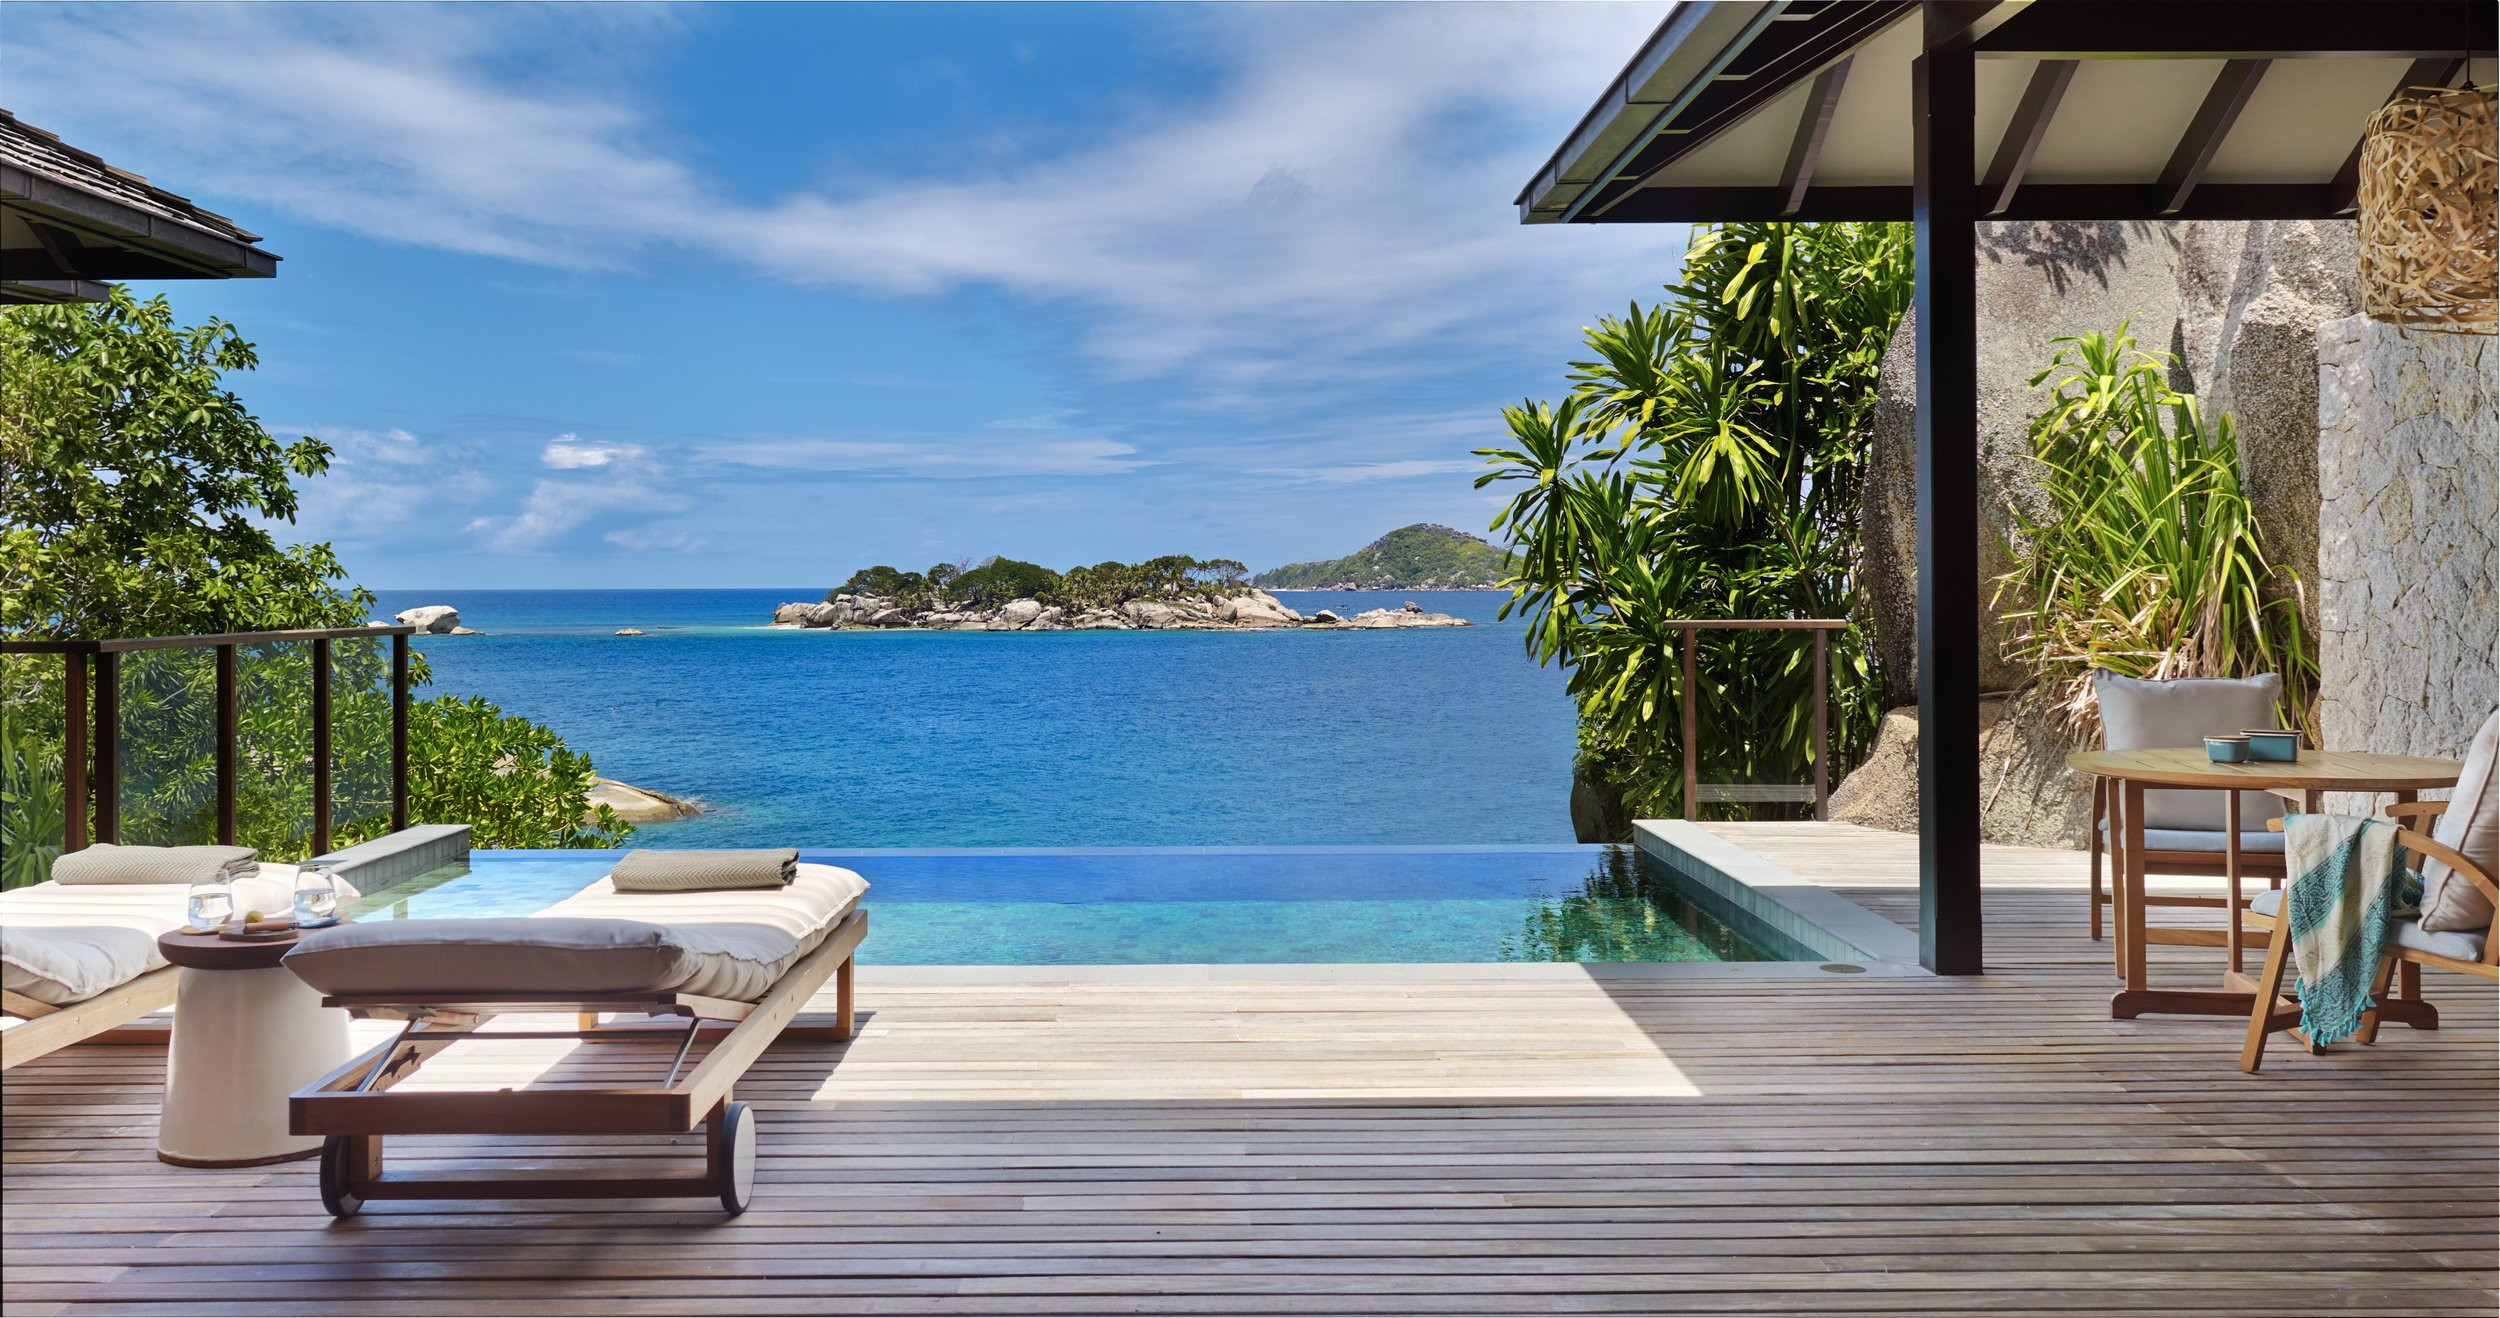 Ocean_Front_Pool_Villa_deck_3_[6658-A4].jpg